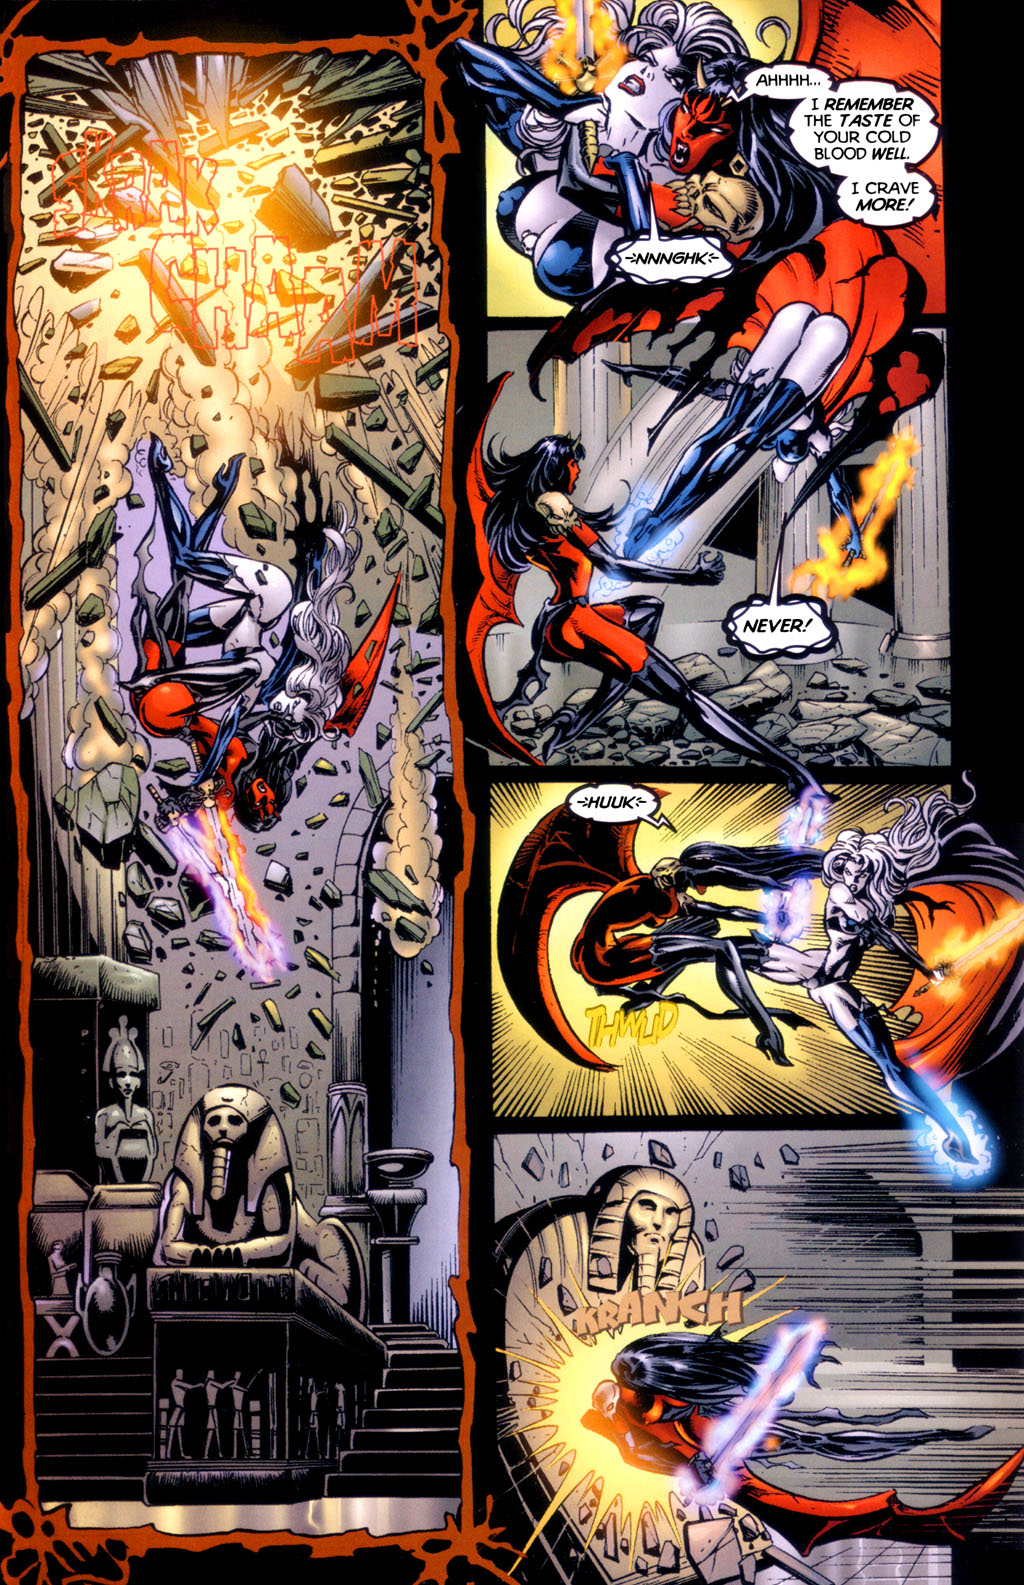 Read online Lady Death vs. Purgatori comic -  Issue # Full - 13